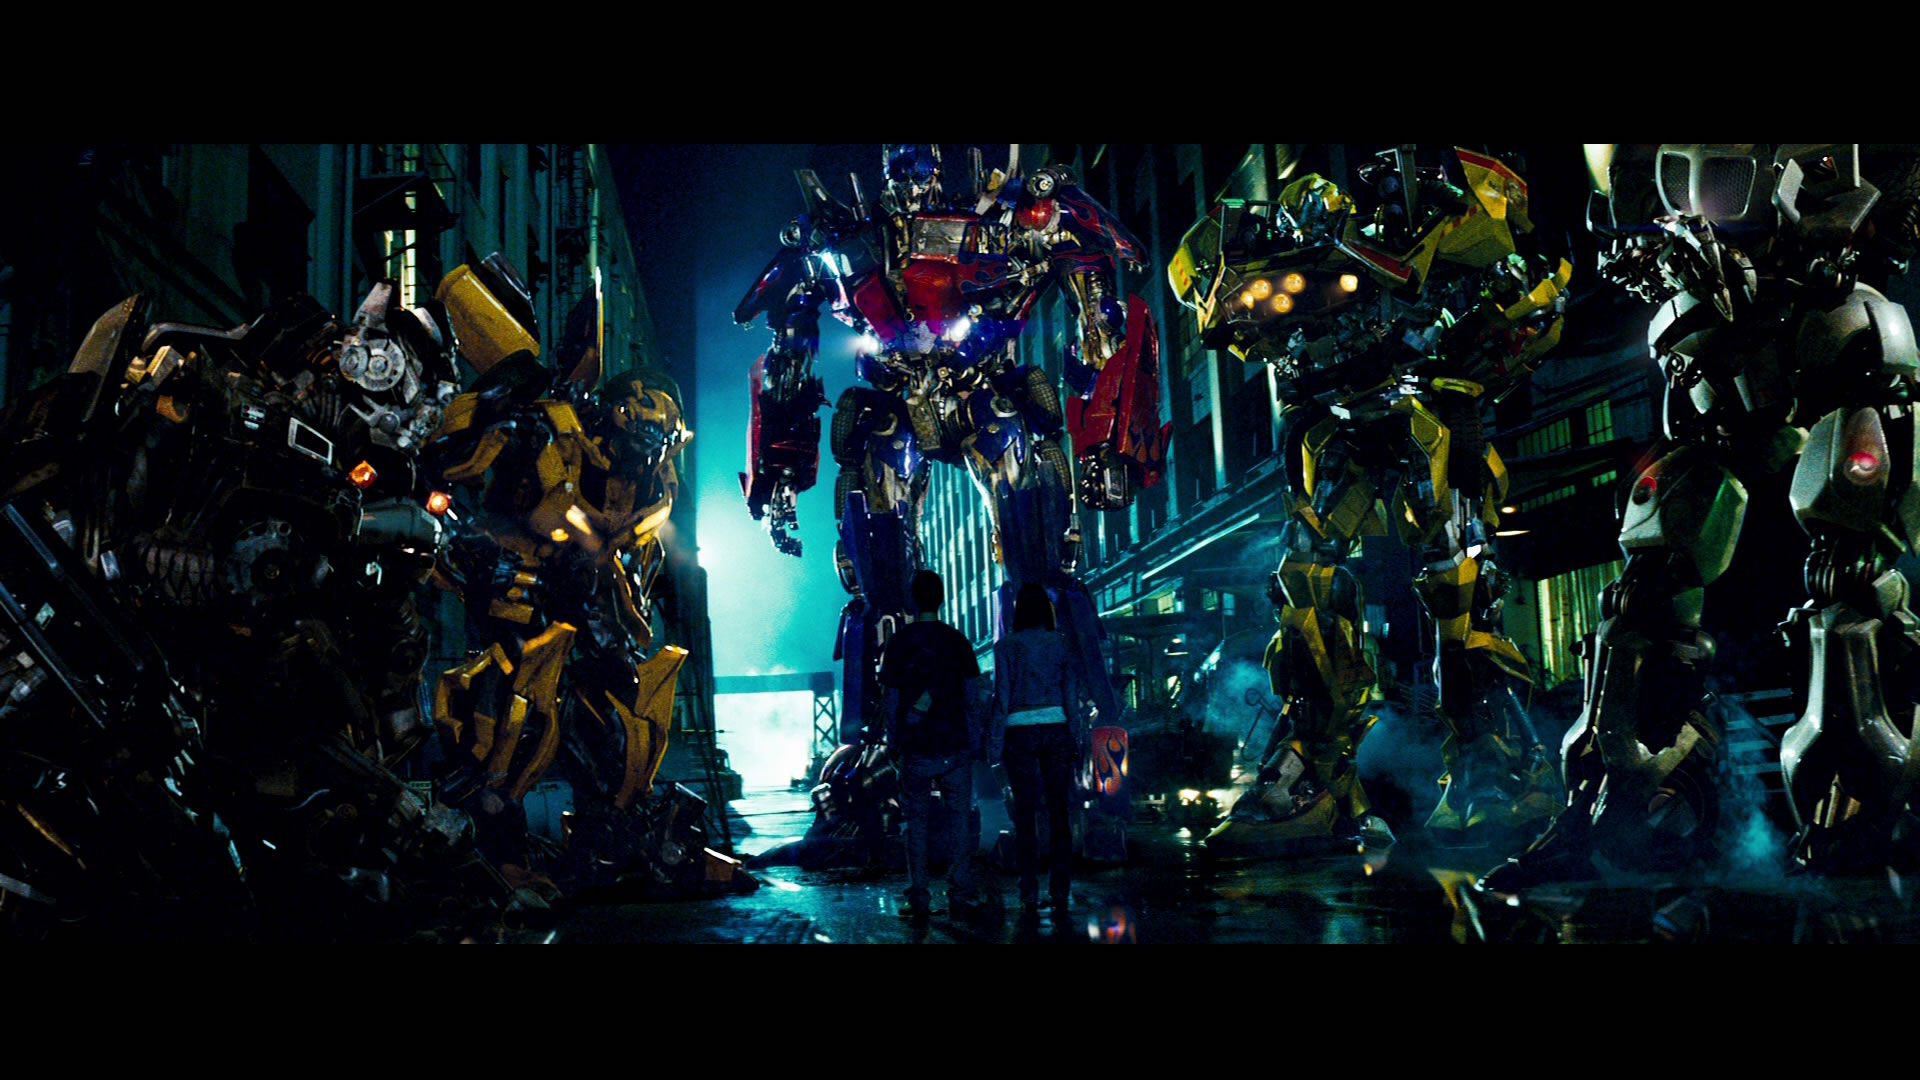 Transformer Hd Wallpapers 1080p Transformers g 1920x1080